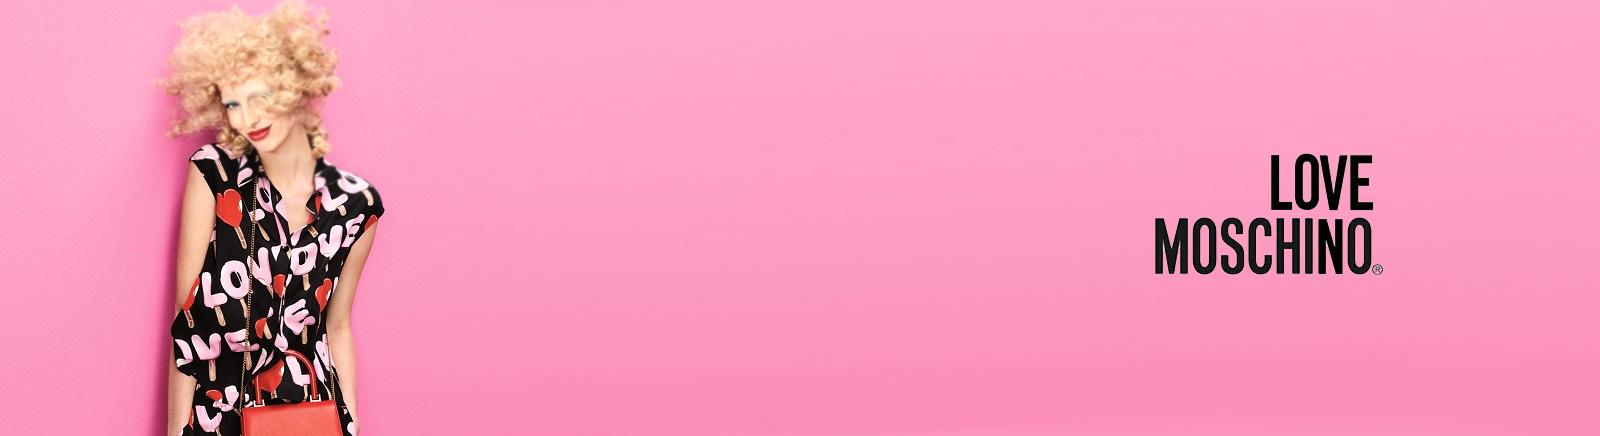 Juppen: Love Moschino Moon Boots für Damen online shoppen